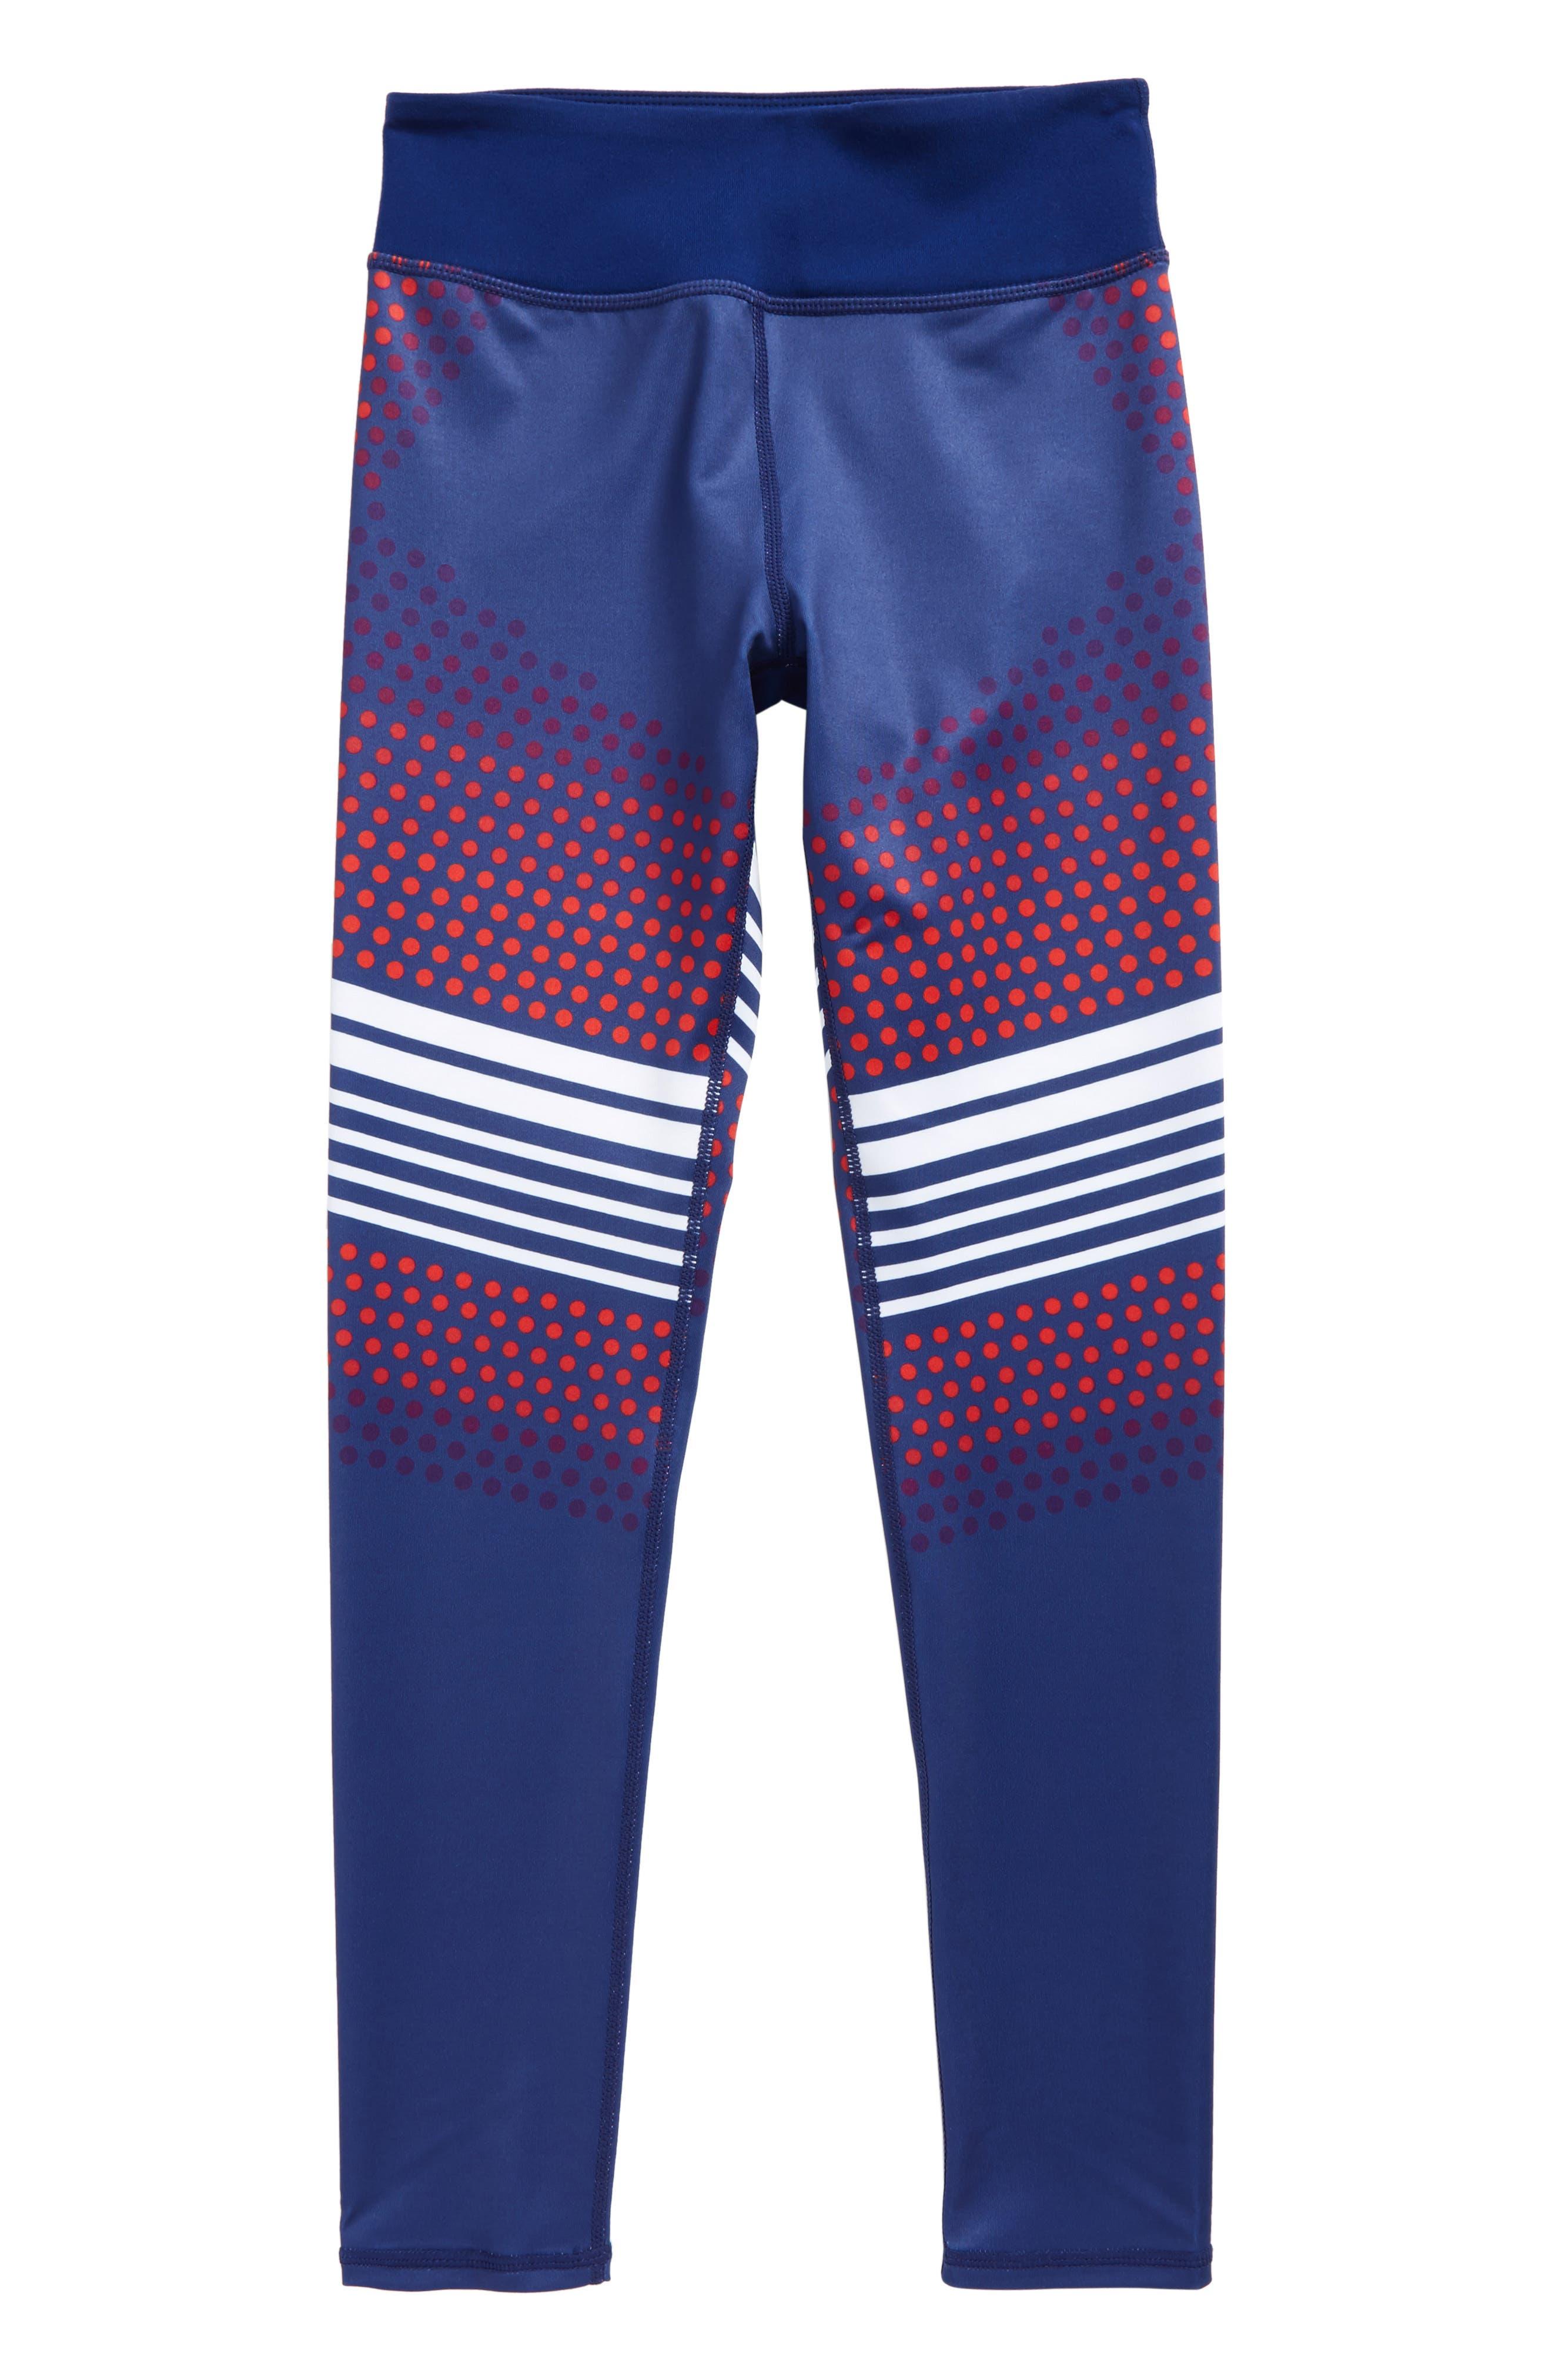 Print High Waist Leggings,                             Main thumbnail 1, color,                             Blue Depths- White Stripes